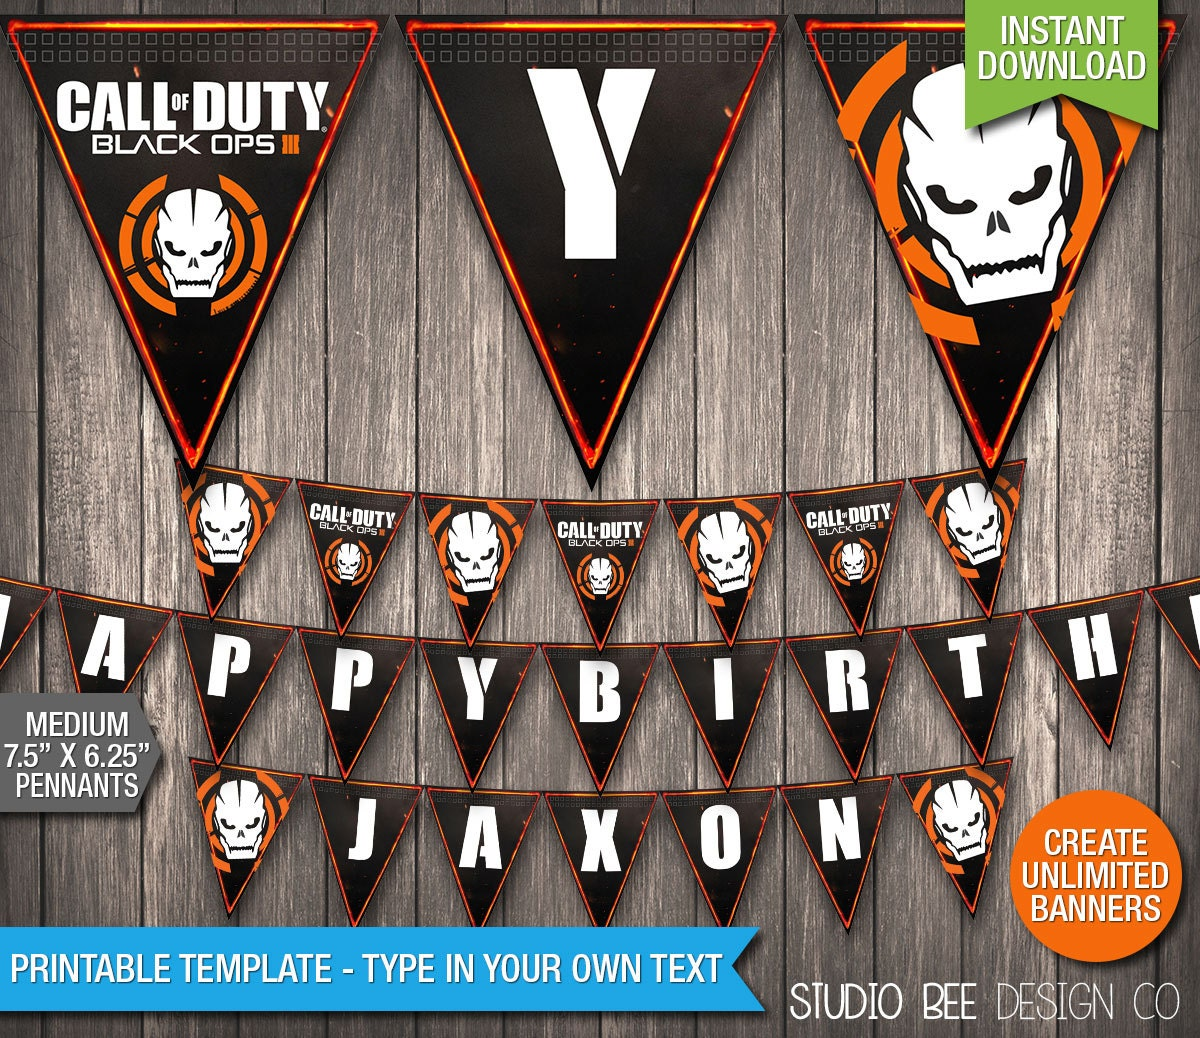 Call Of Duty Black Ops 3 Banner INSTANT By StudioBeeDesignCo